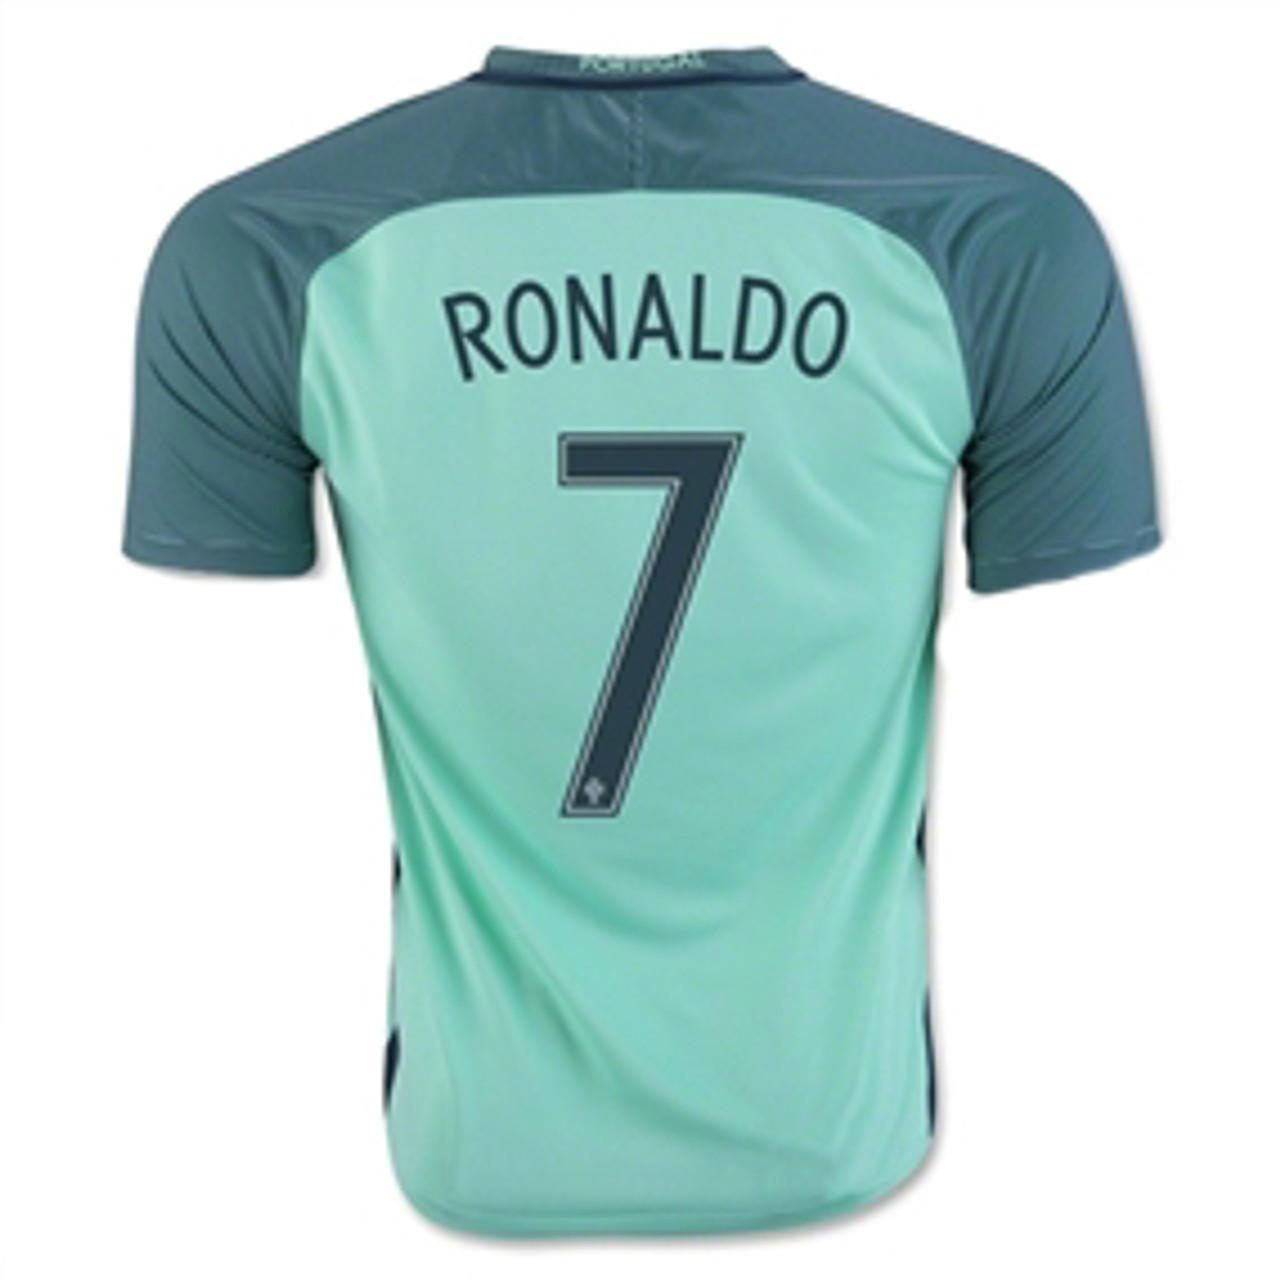 new style 9a0de c01ba NIKE PORTUGAL 2016 BOYS AWAY `RONALDO` JERSEY green